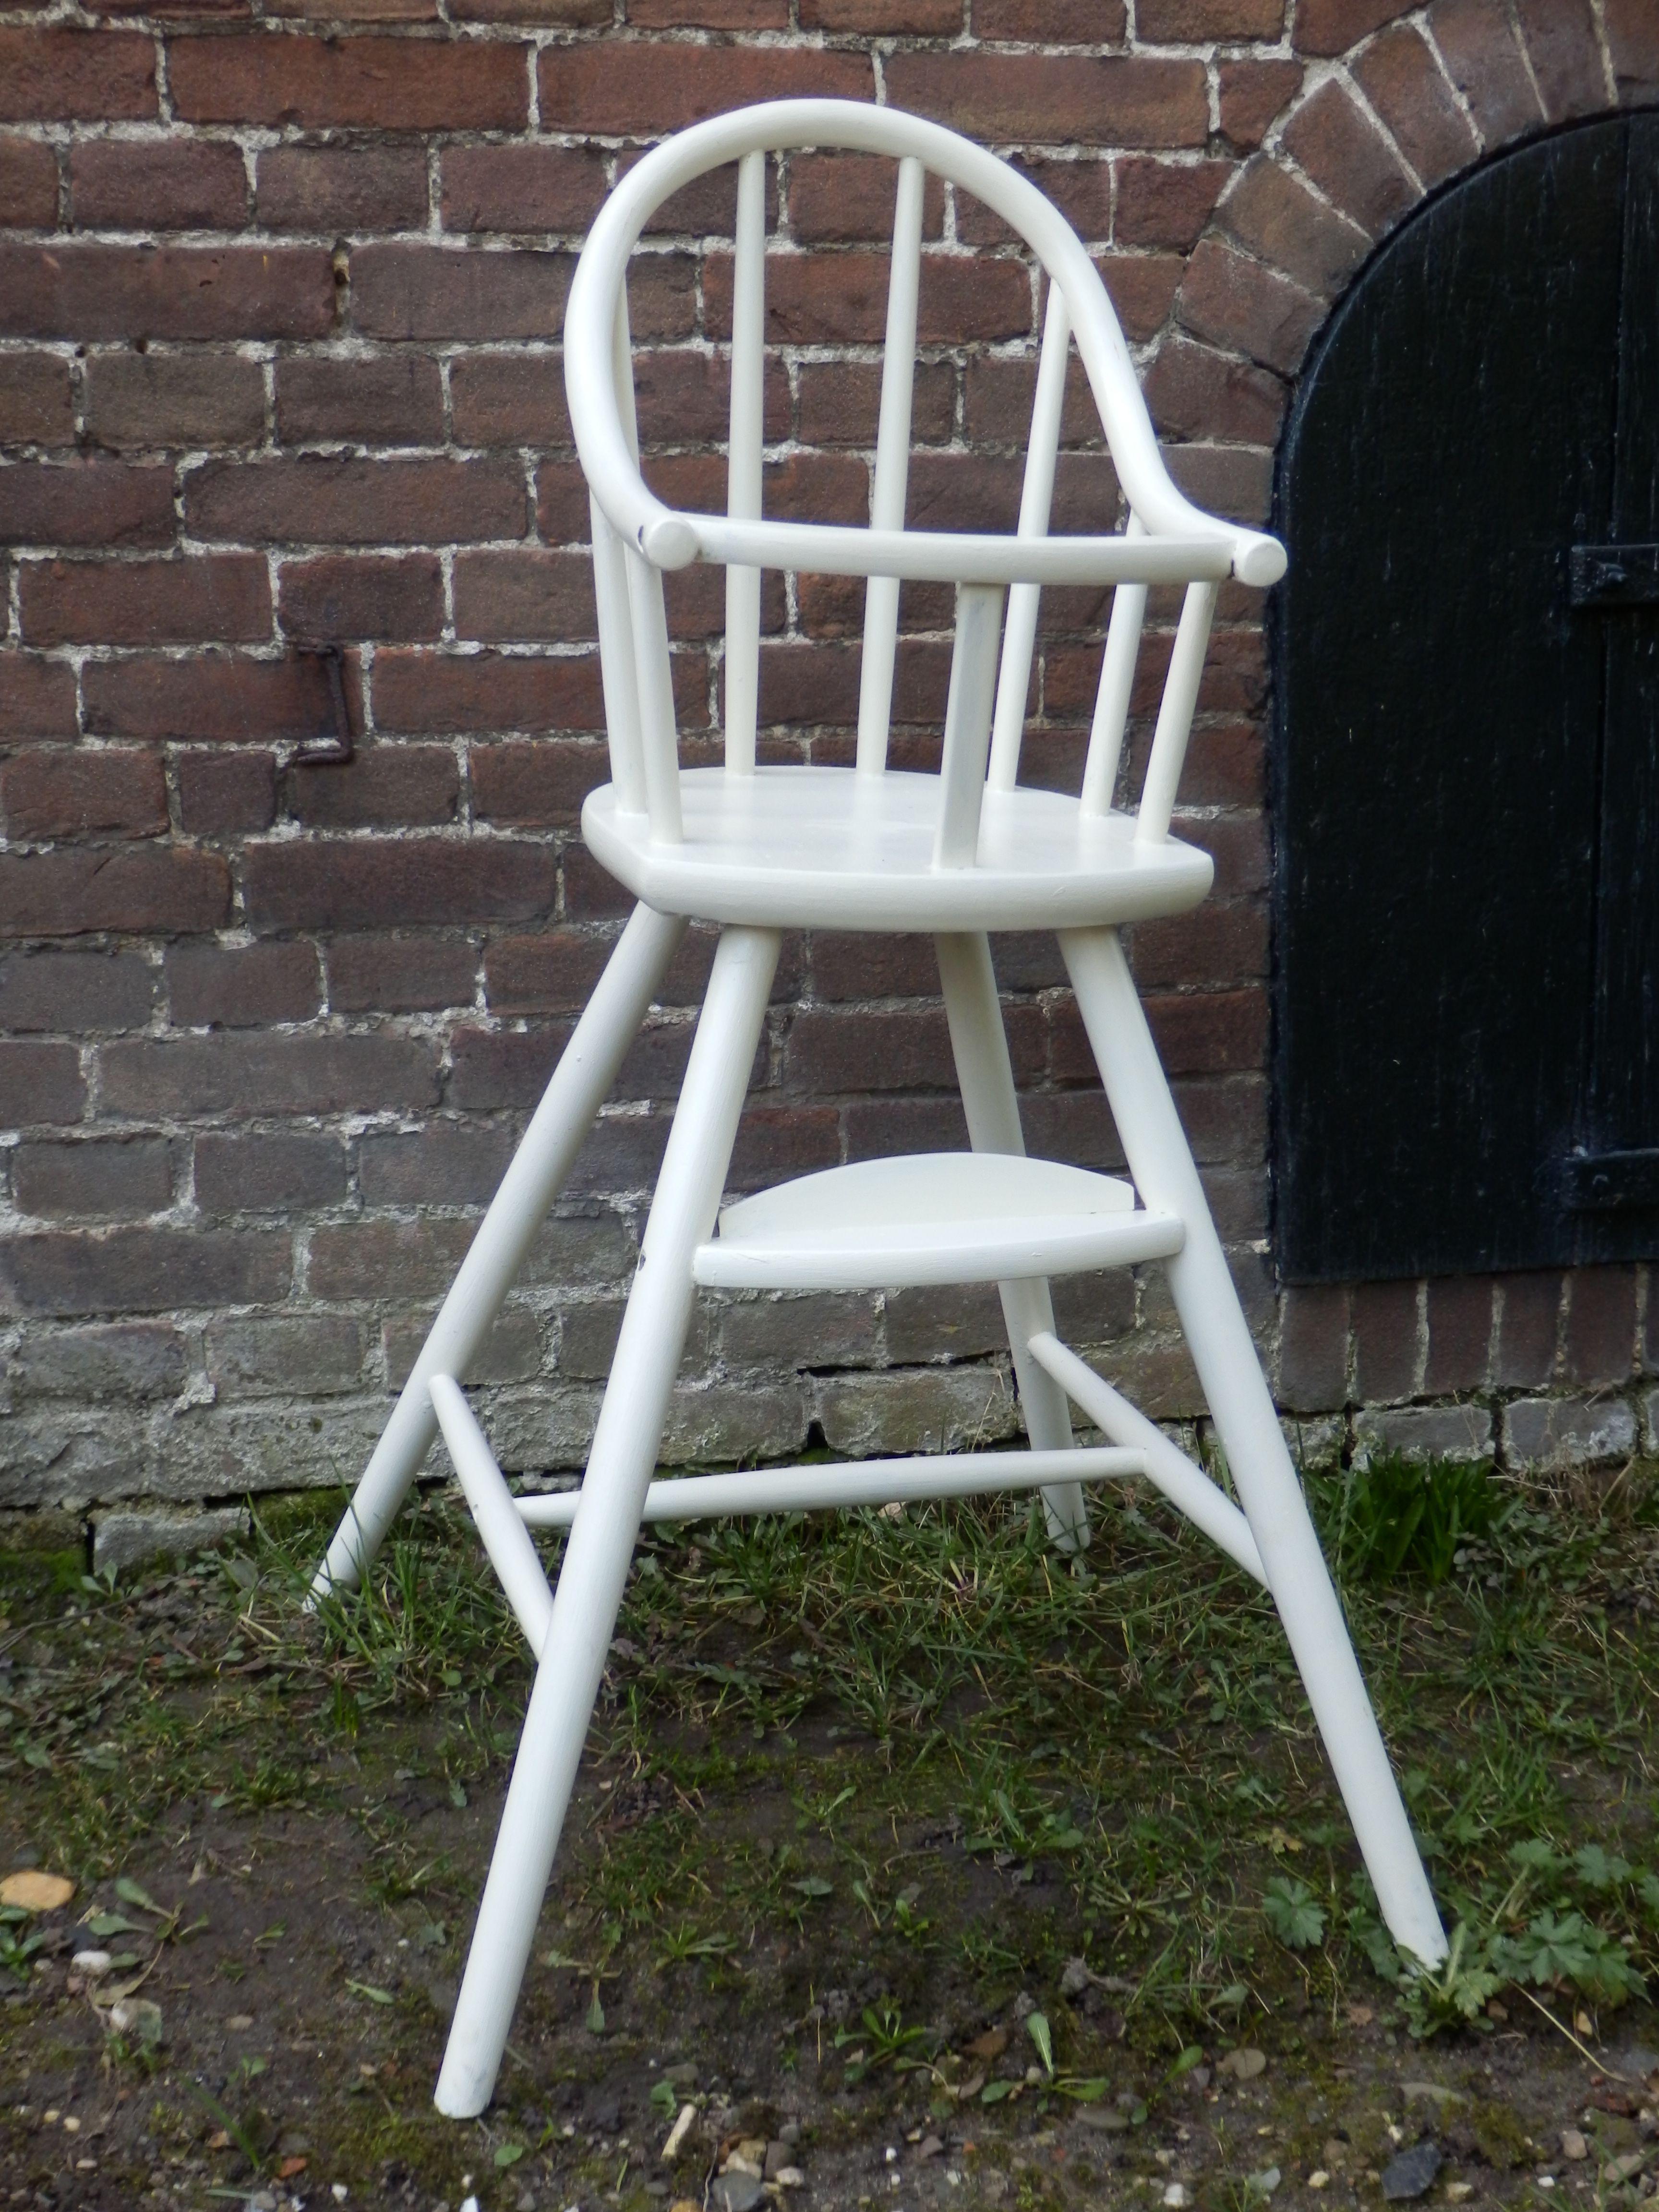 Kinderstoel Wit Hout.Verkocht Witte Houten Kinderstoel Brocante Stijl De Stoel Is Wit